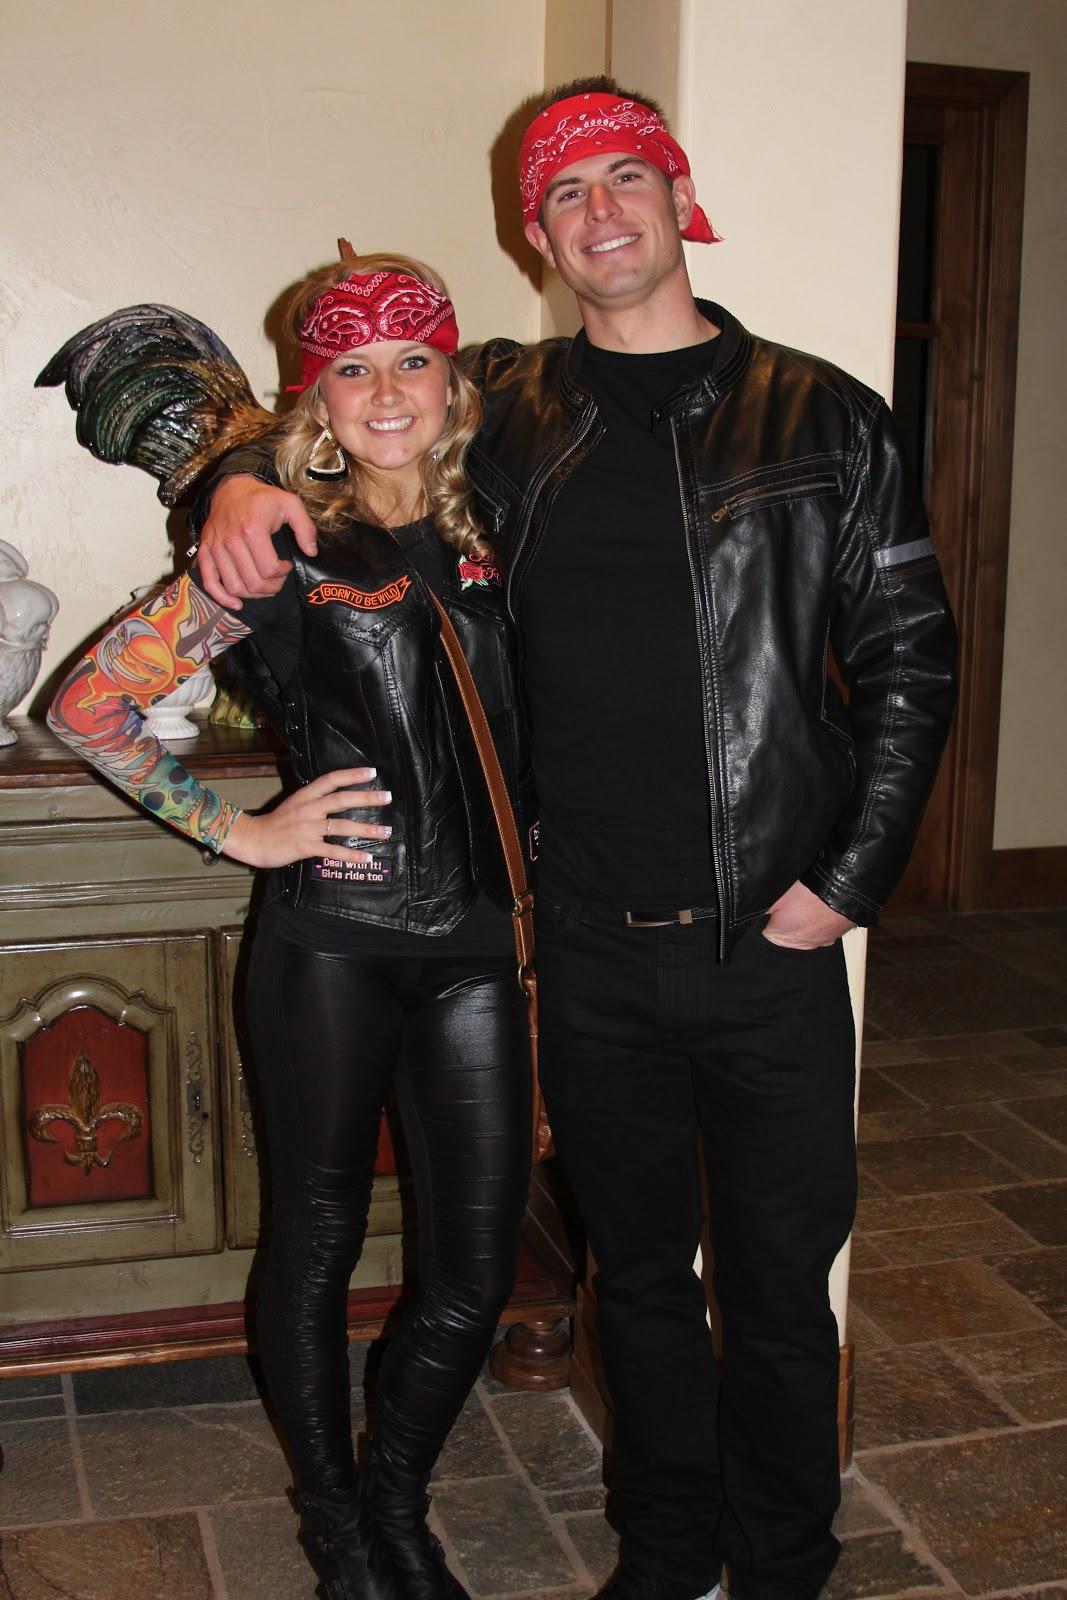 biker couple costume - photo #1